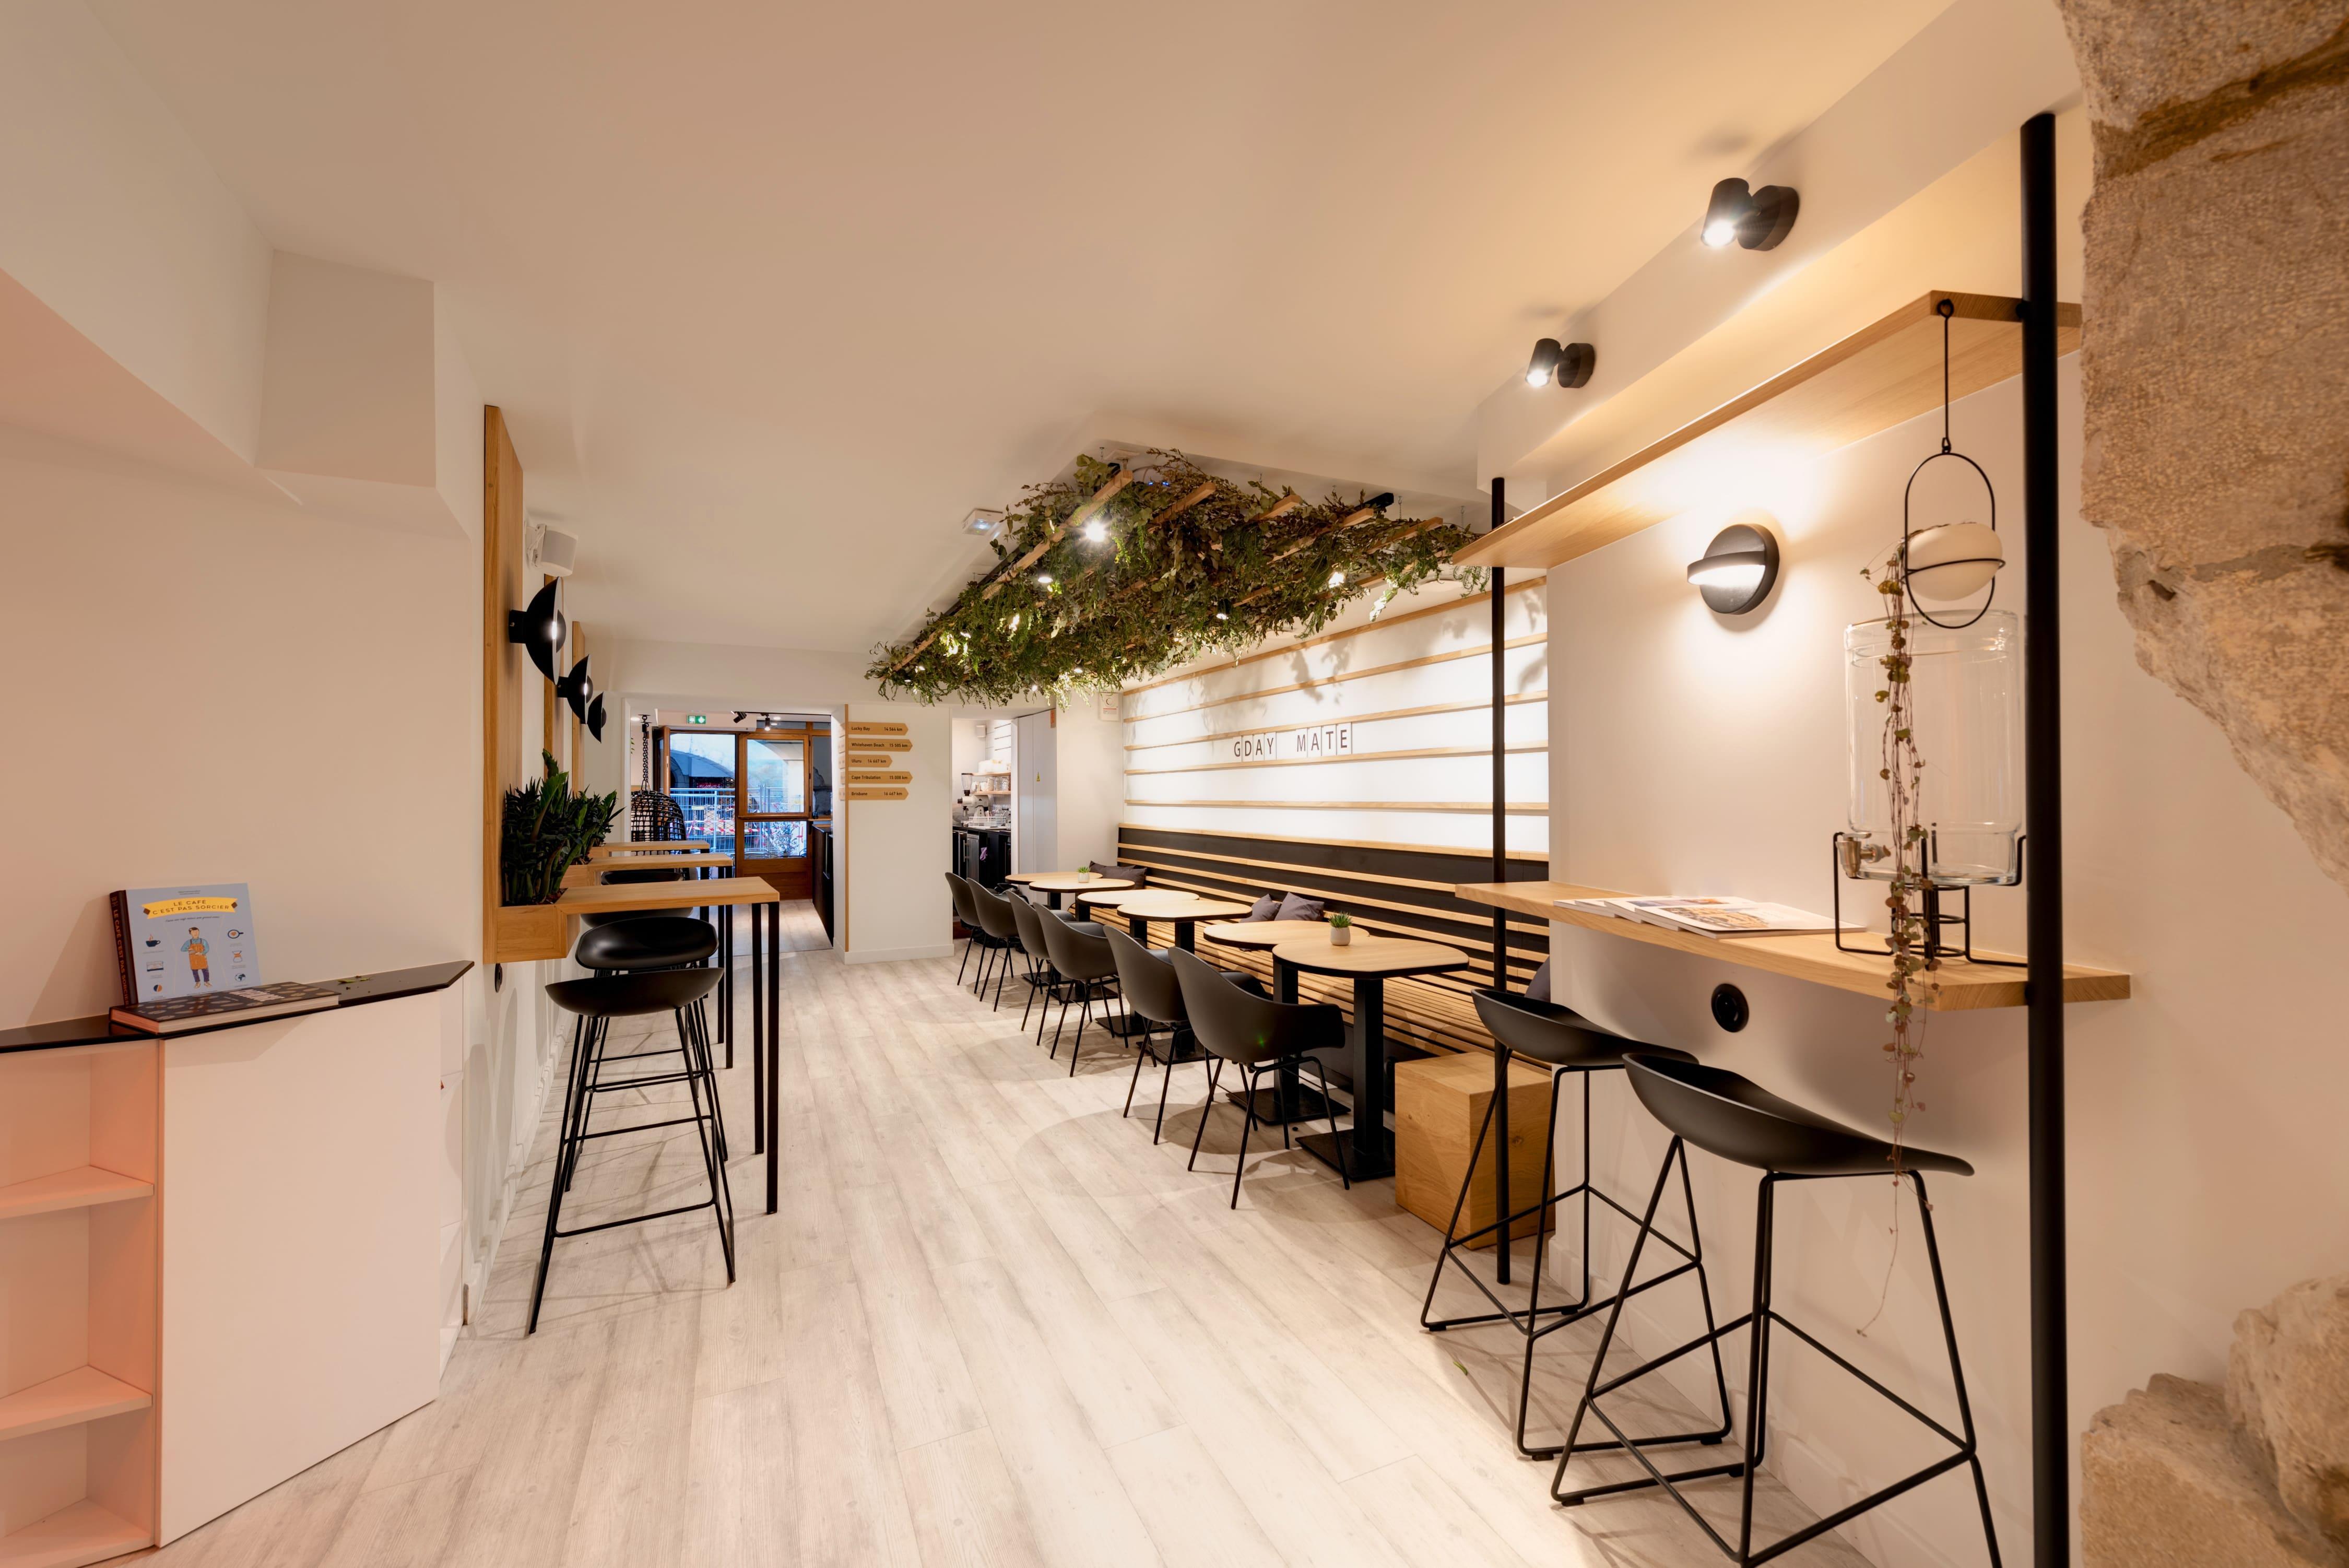 Agencement interieur design métallique ROBI restaurant Haven Annecy 74 agencement en metal 3